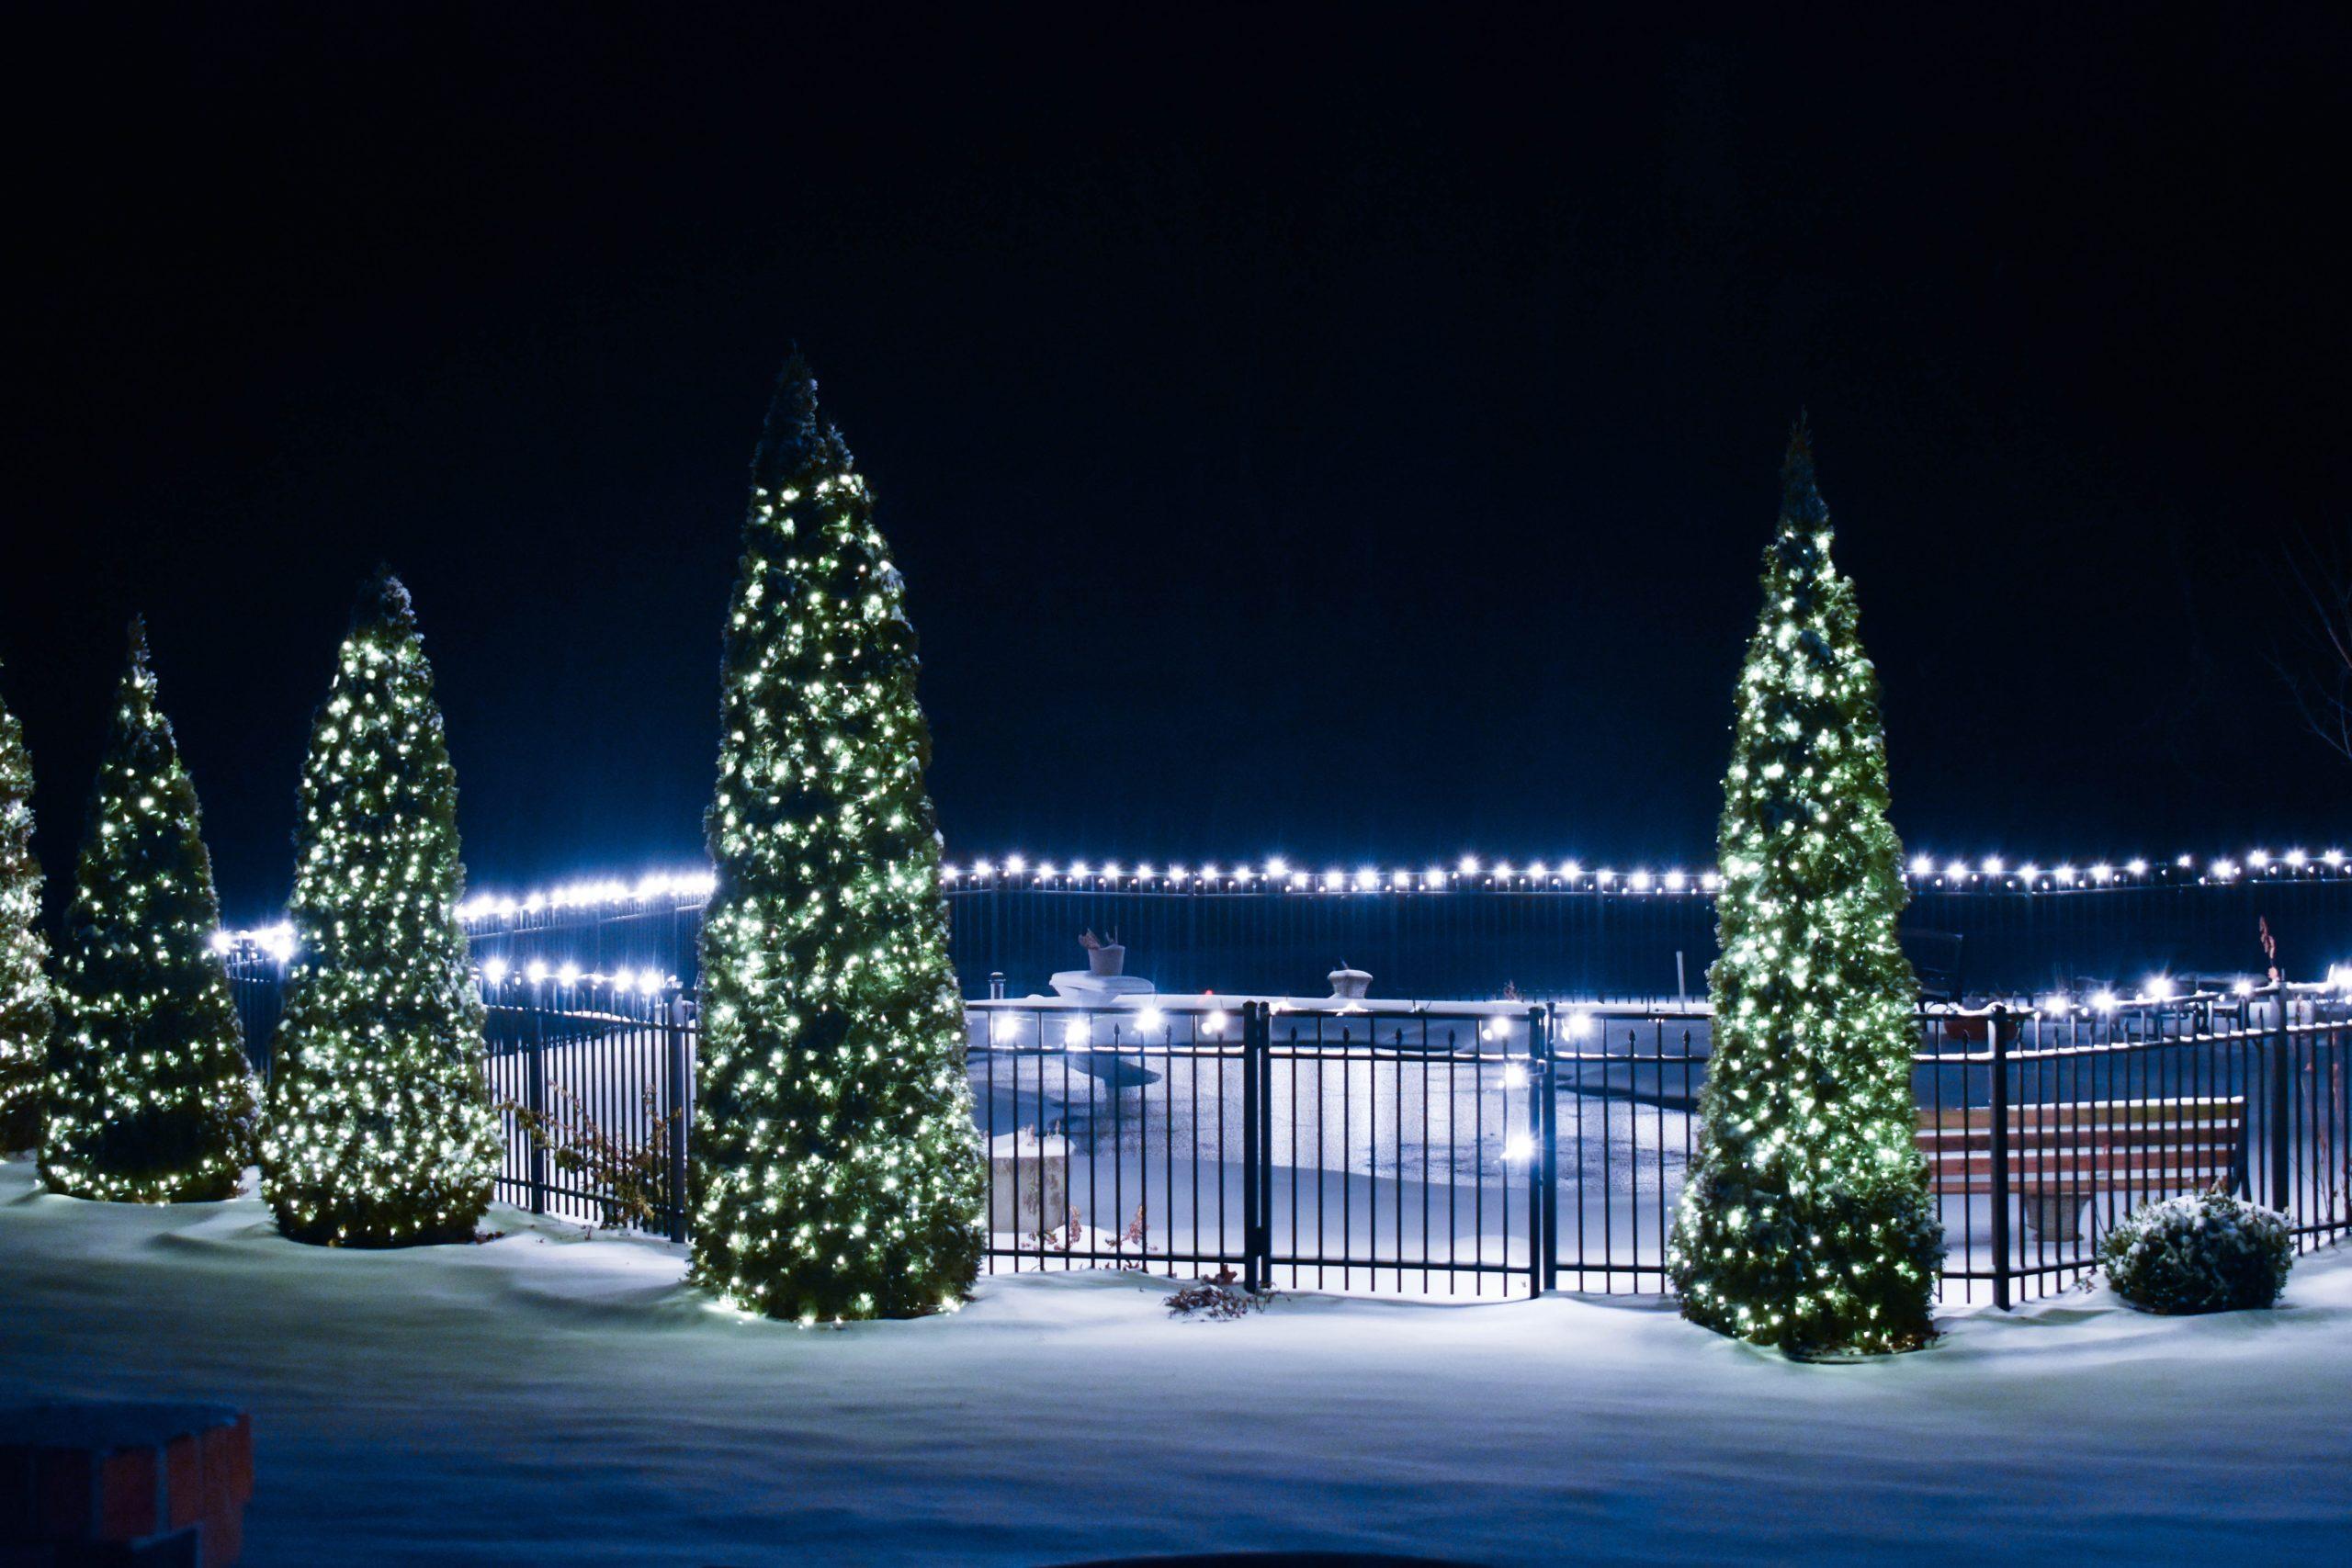 interchangeable Christmas trees